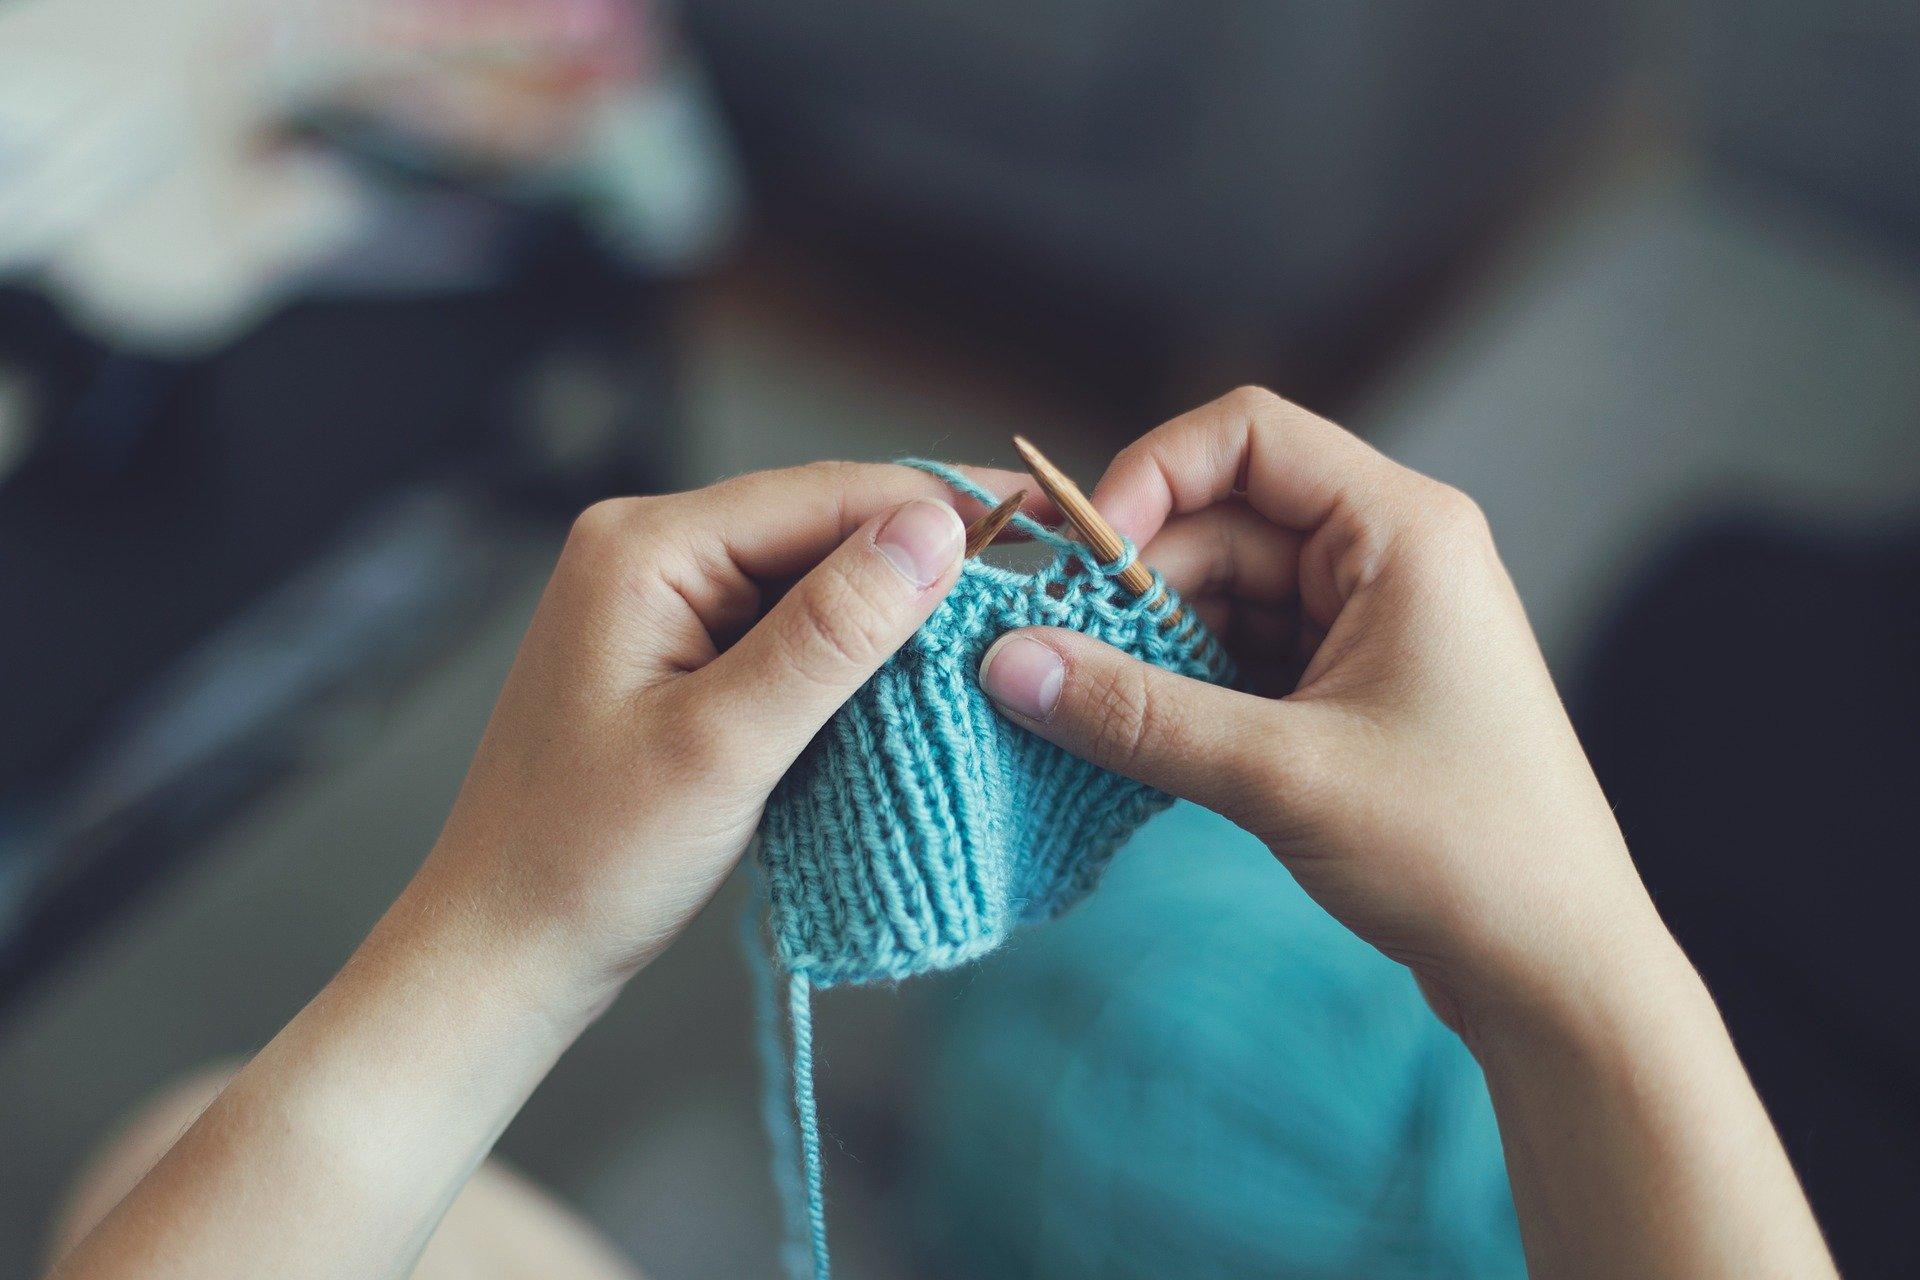 Person holding blue yarn, knitting.